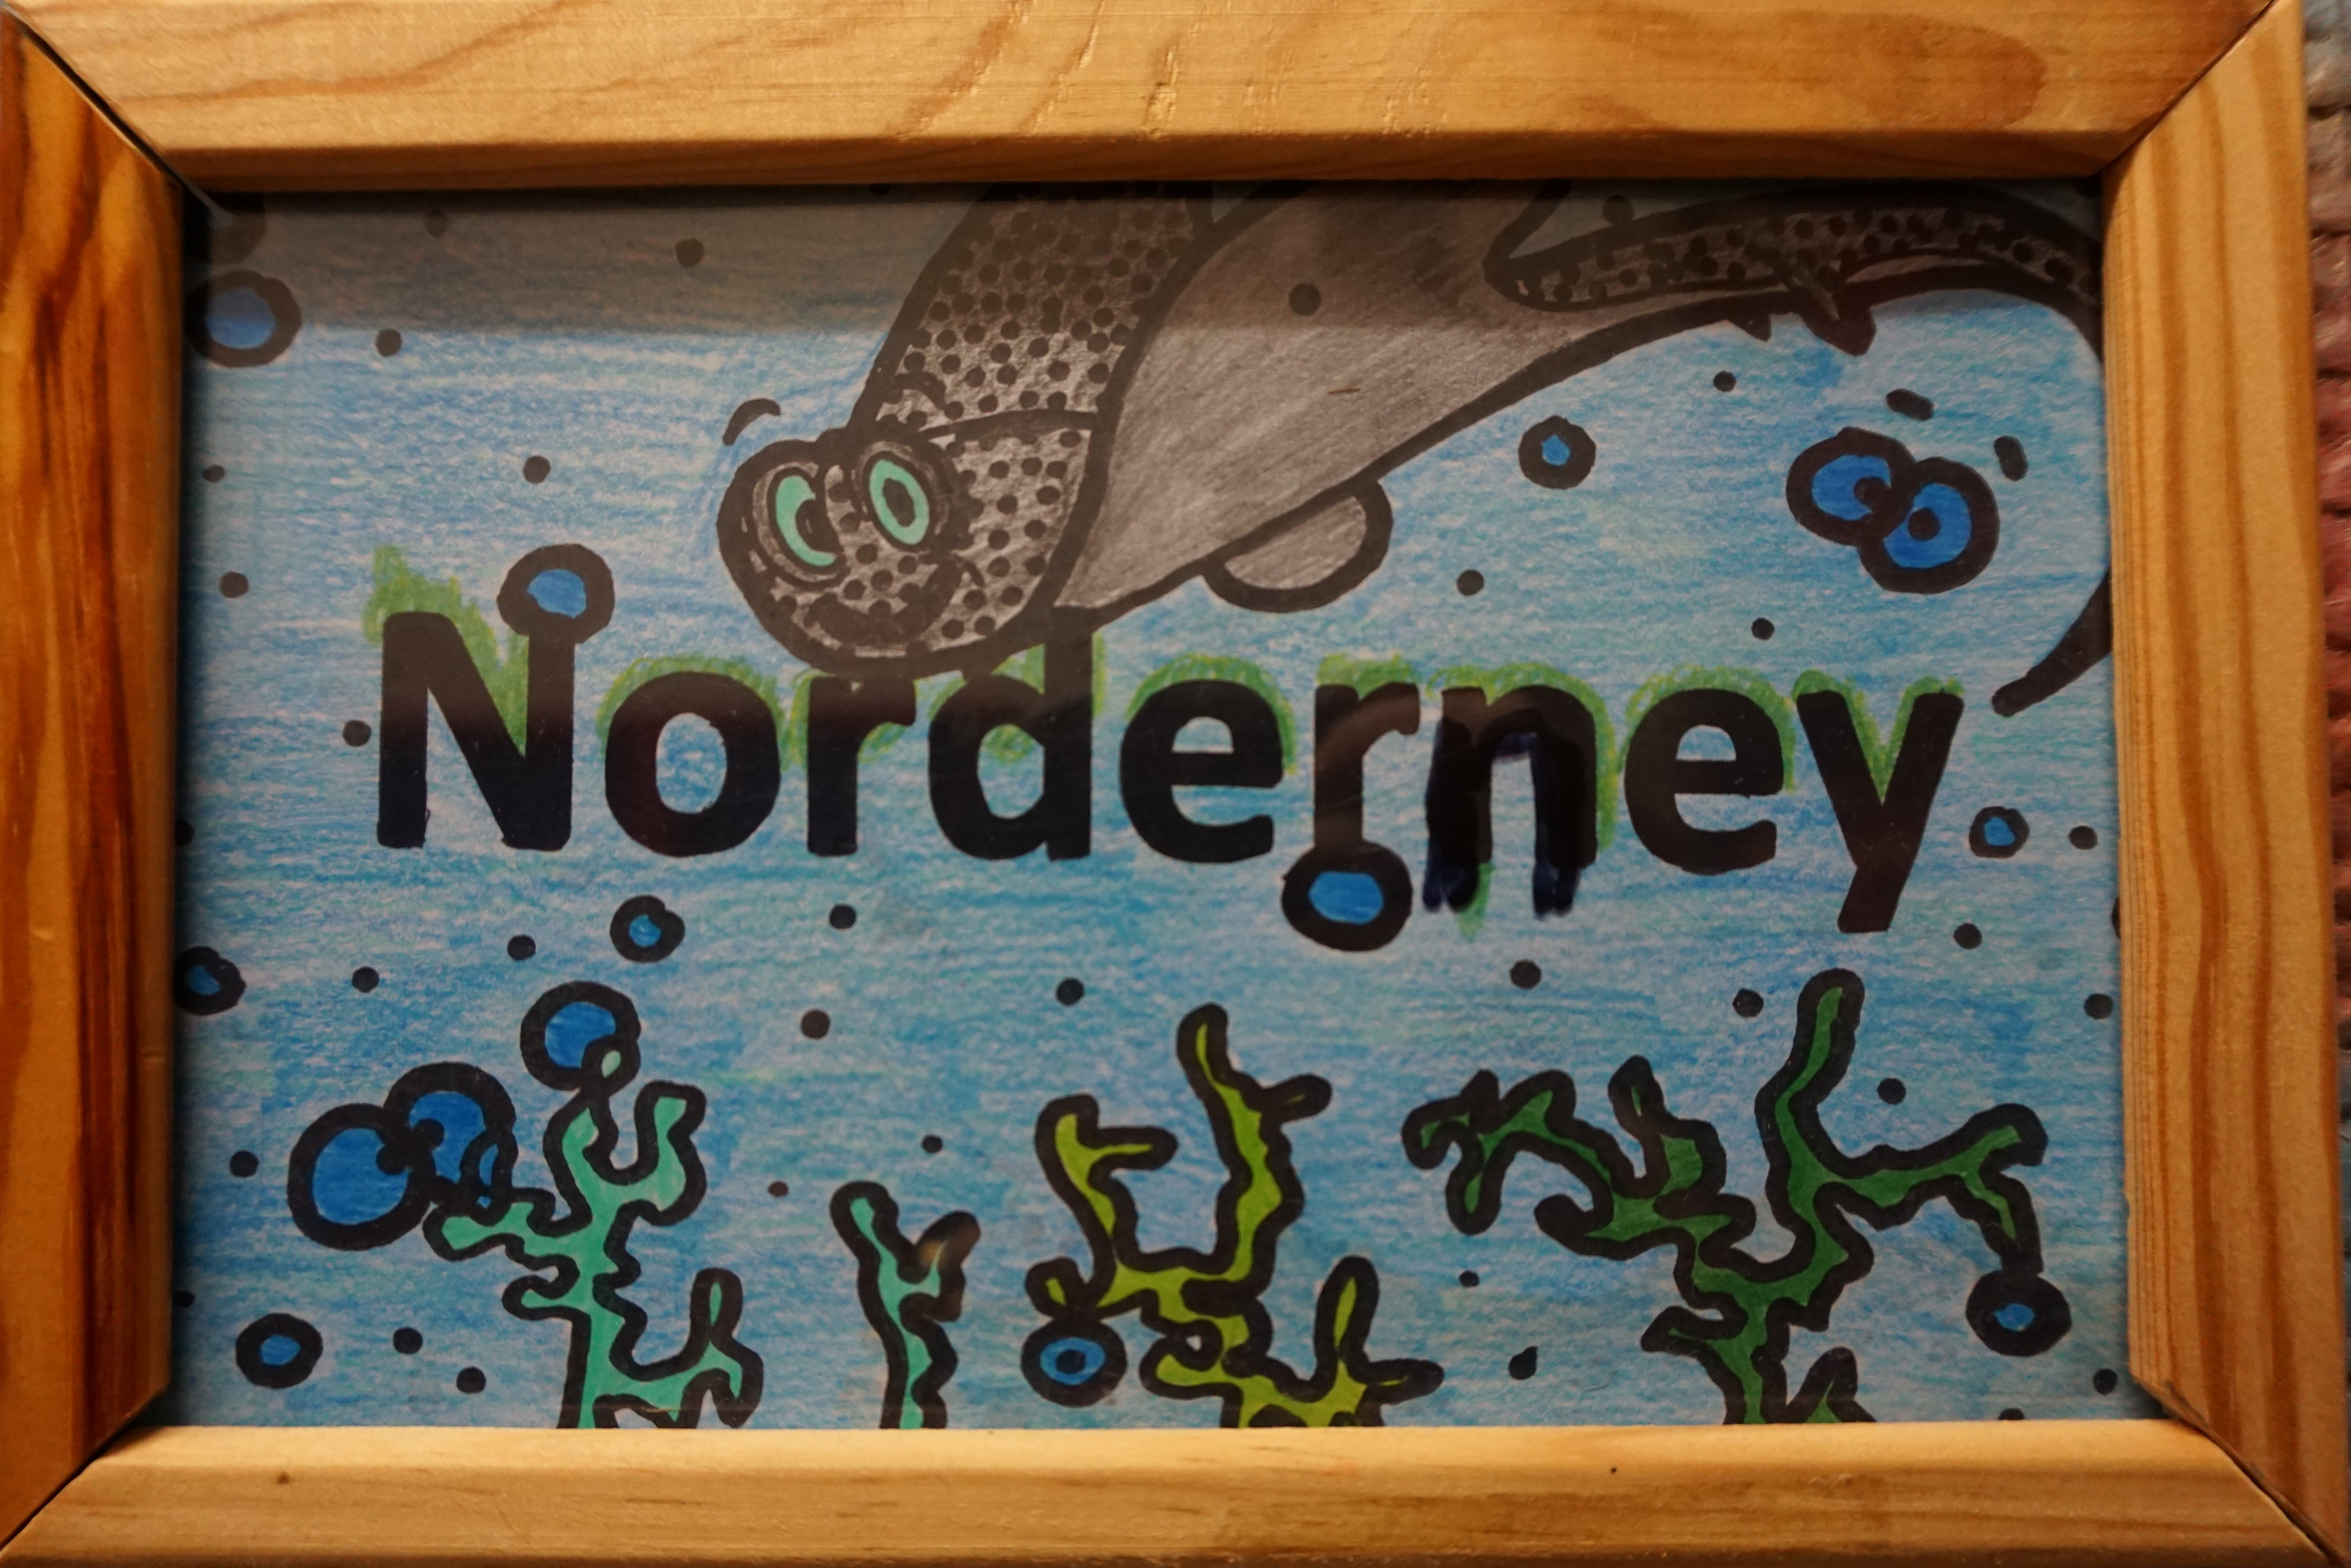 3 Norderney